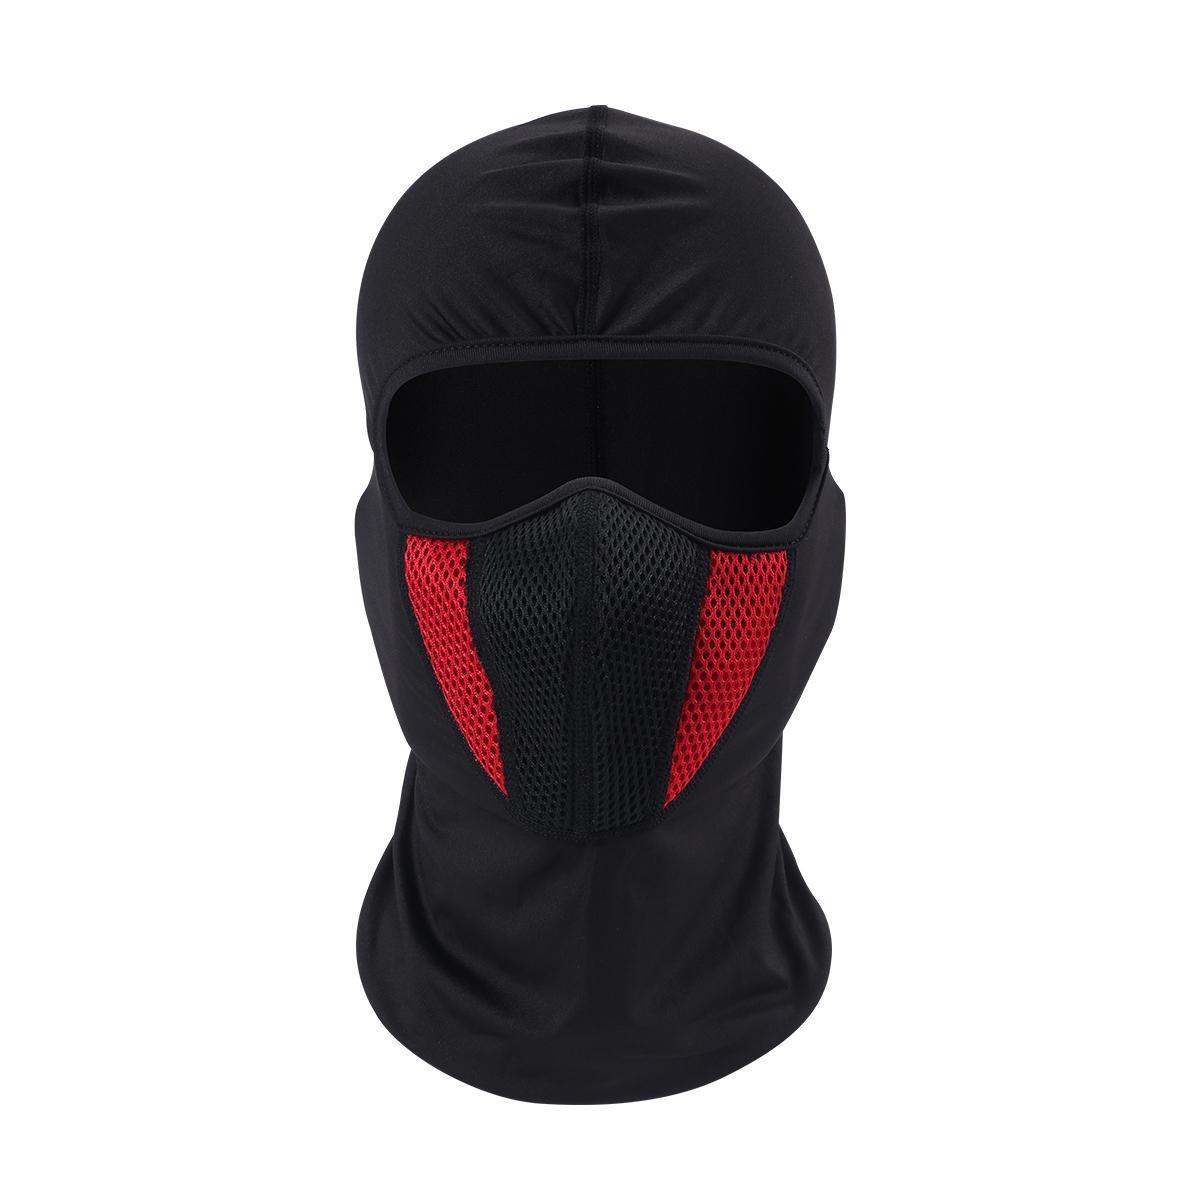 Balaclava Moto Face Mask Motorcycle Face Shield Tactical Airsoft Paintball Cycling Bike Ski Army Helmet Full Face Mask